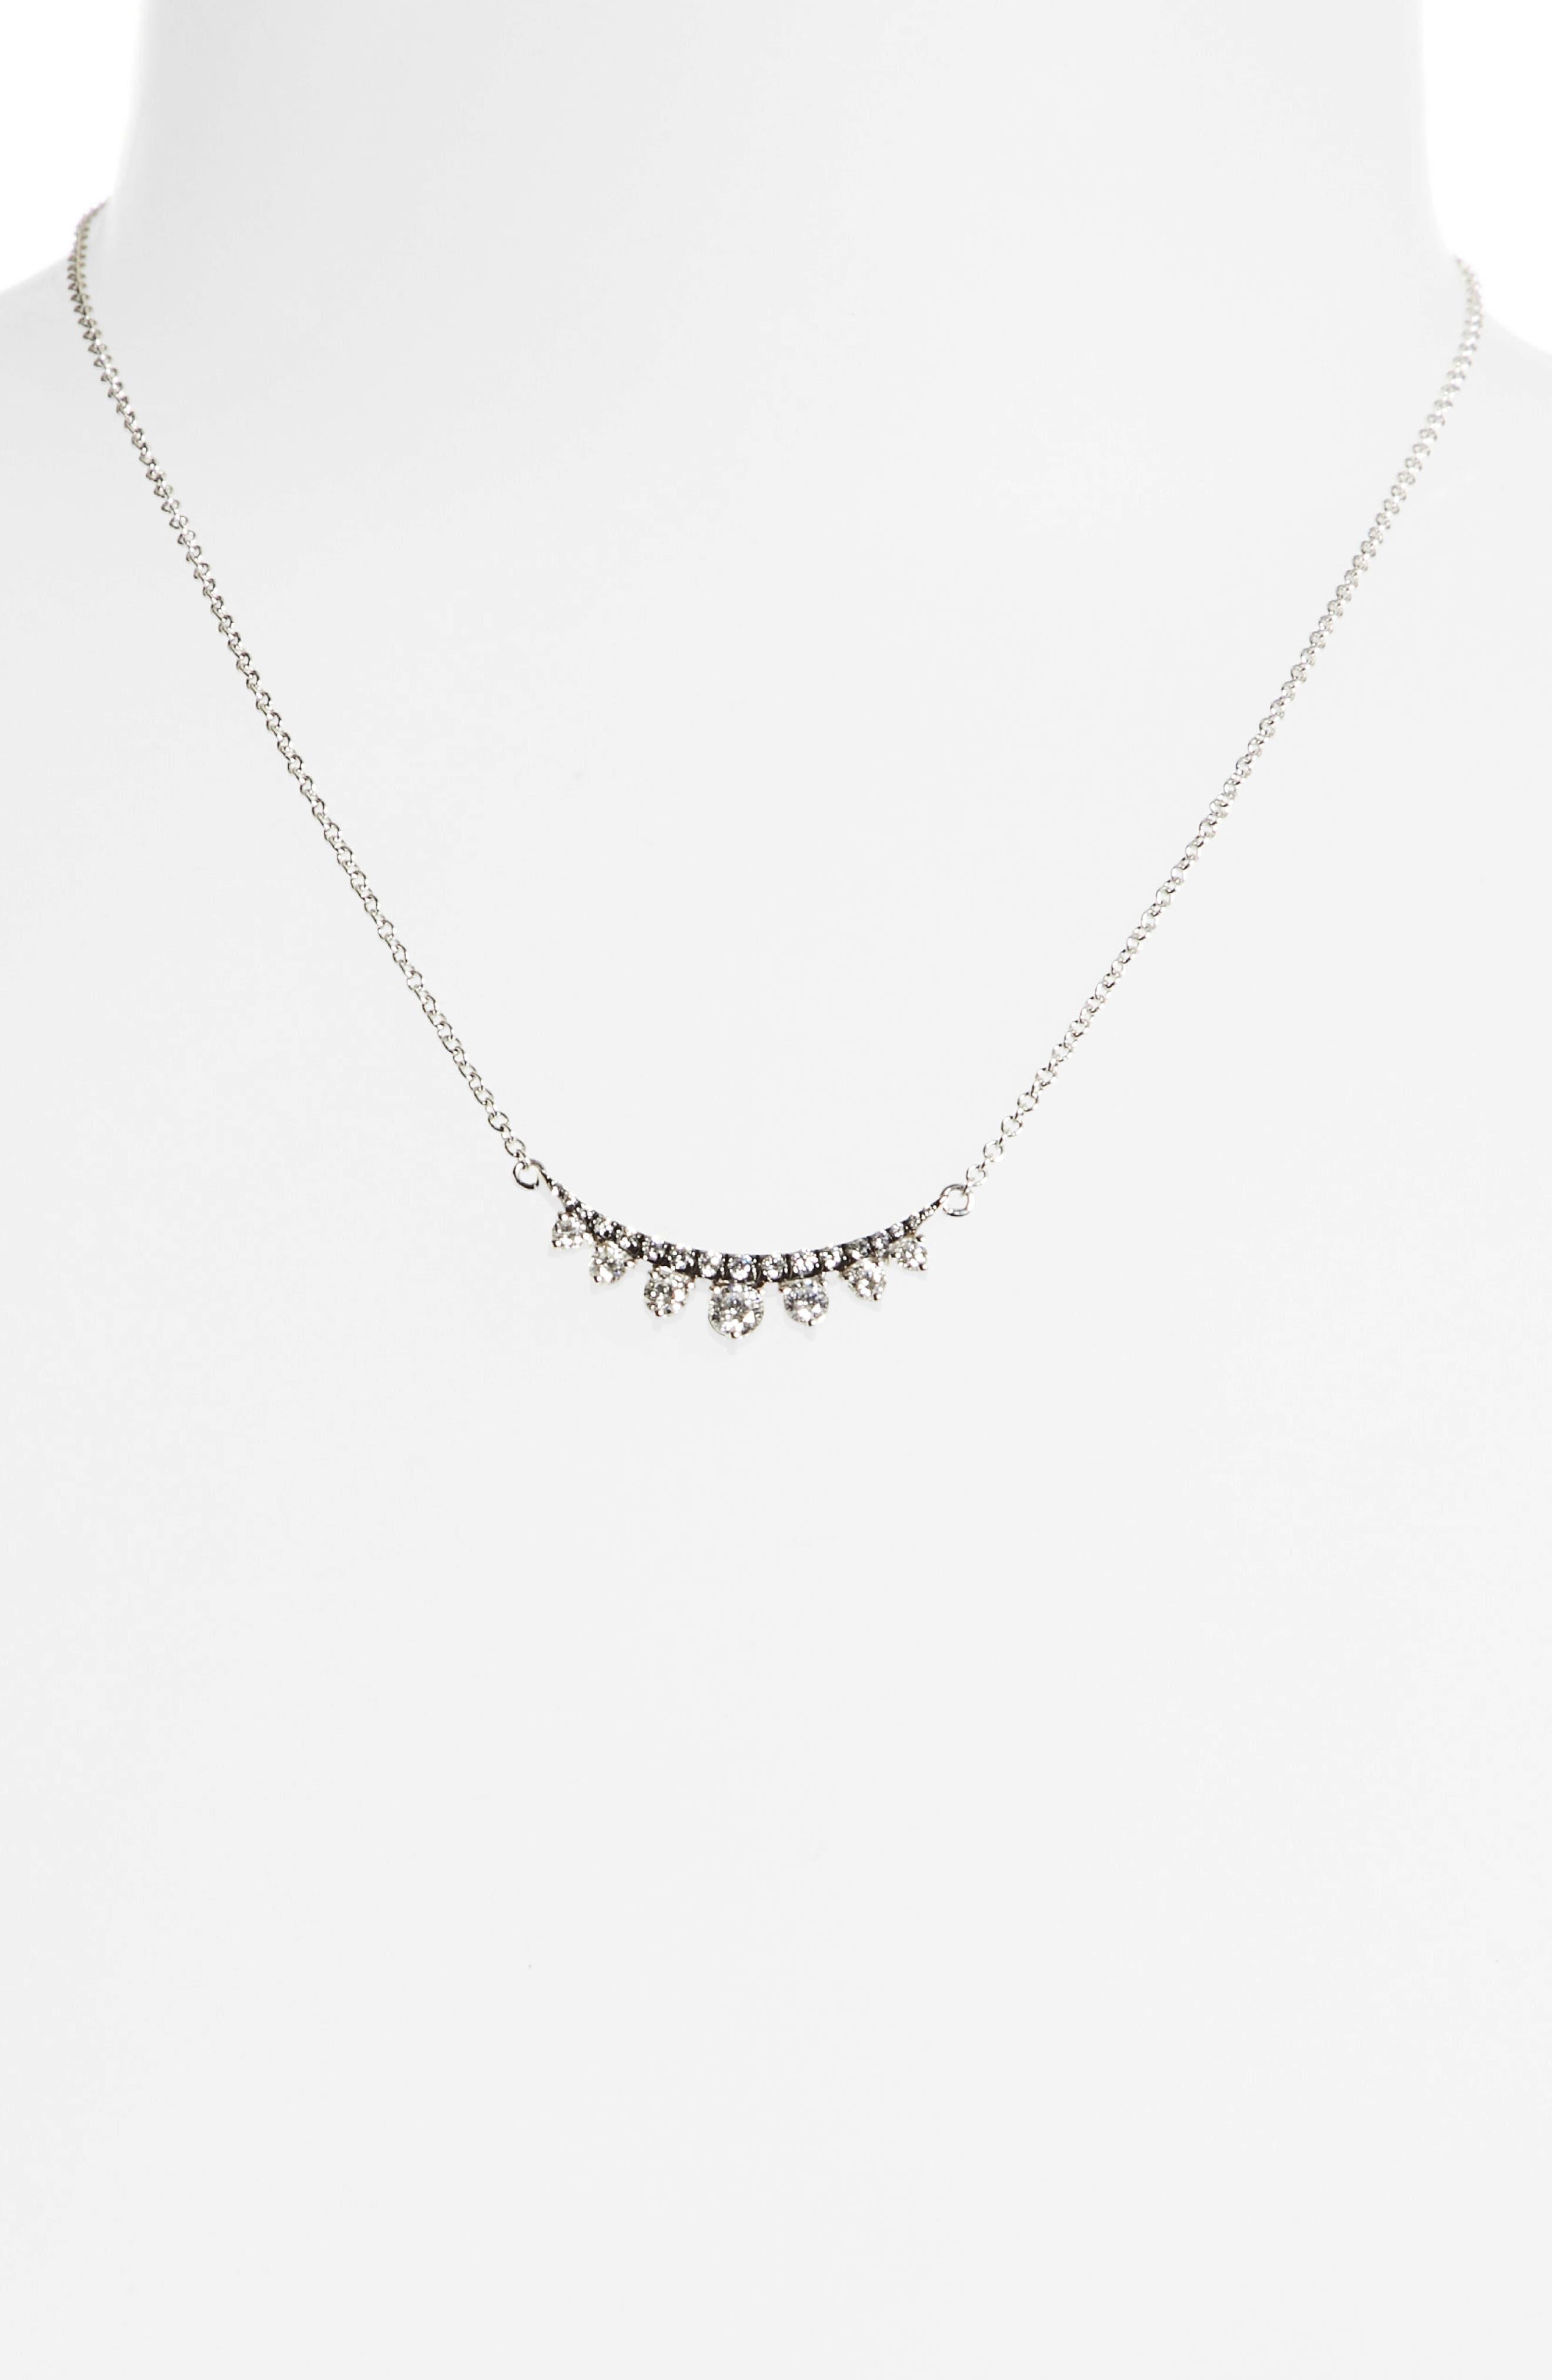 Jemma Wynne Prive Luxe 18K White Gold & Diamond Necklace